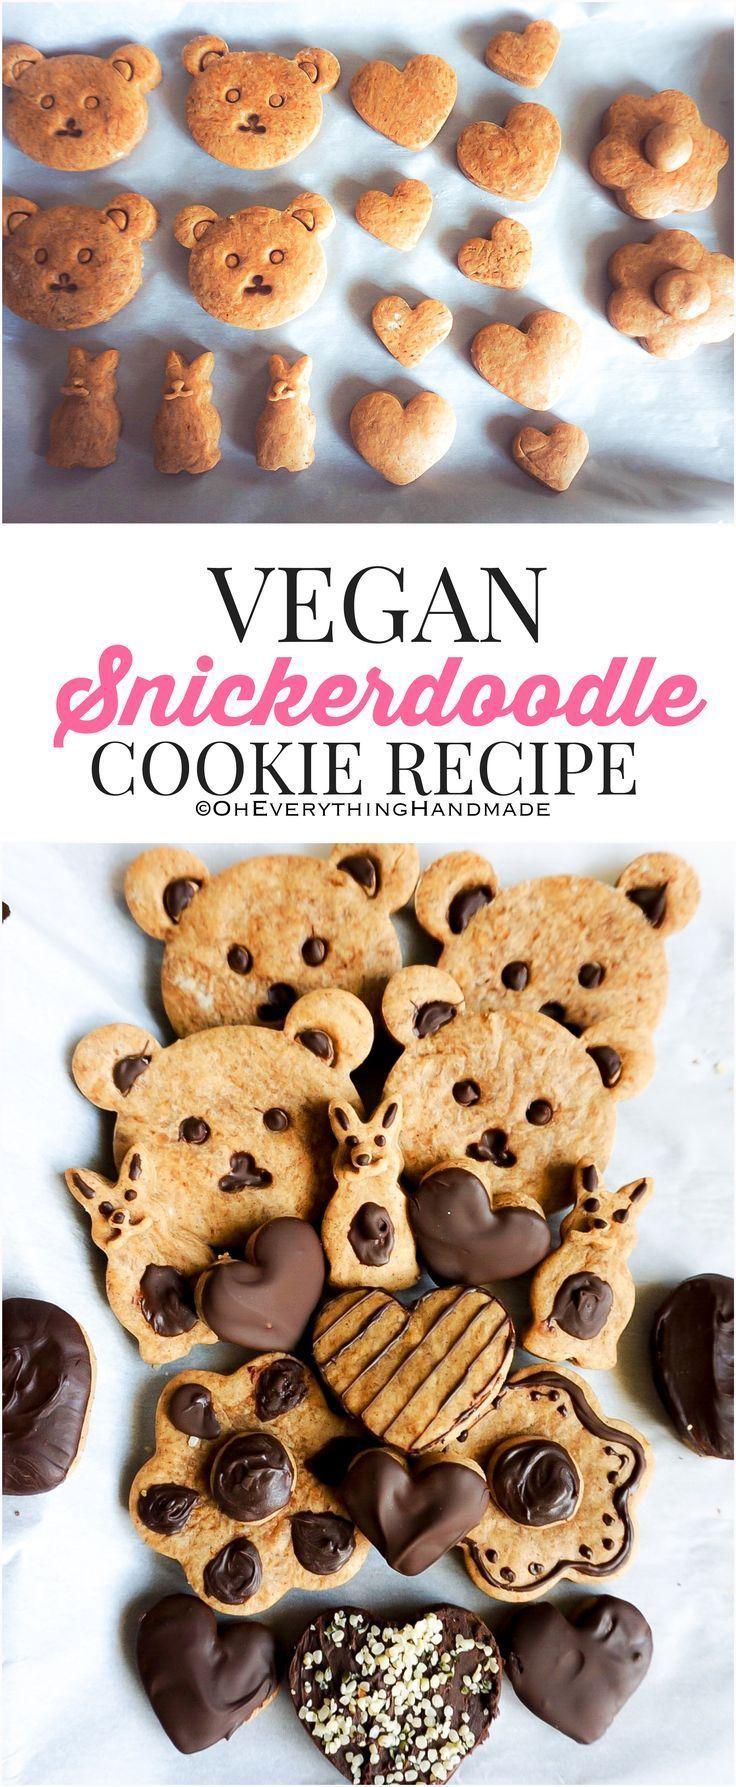 Vegane Snickerdoodle Kekse